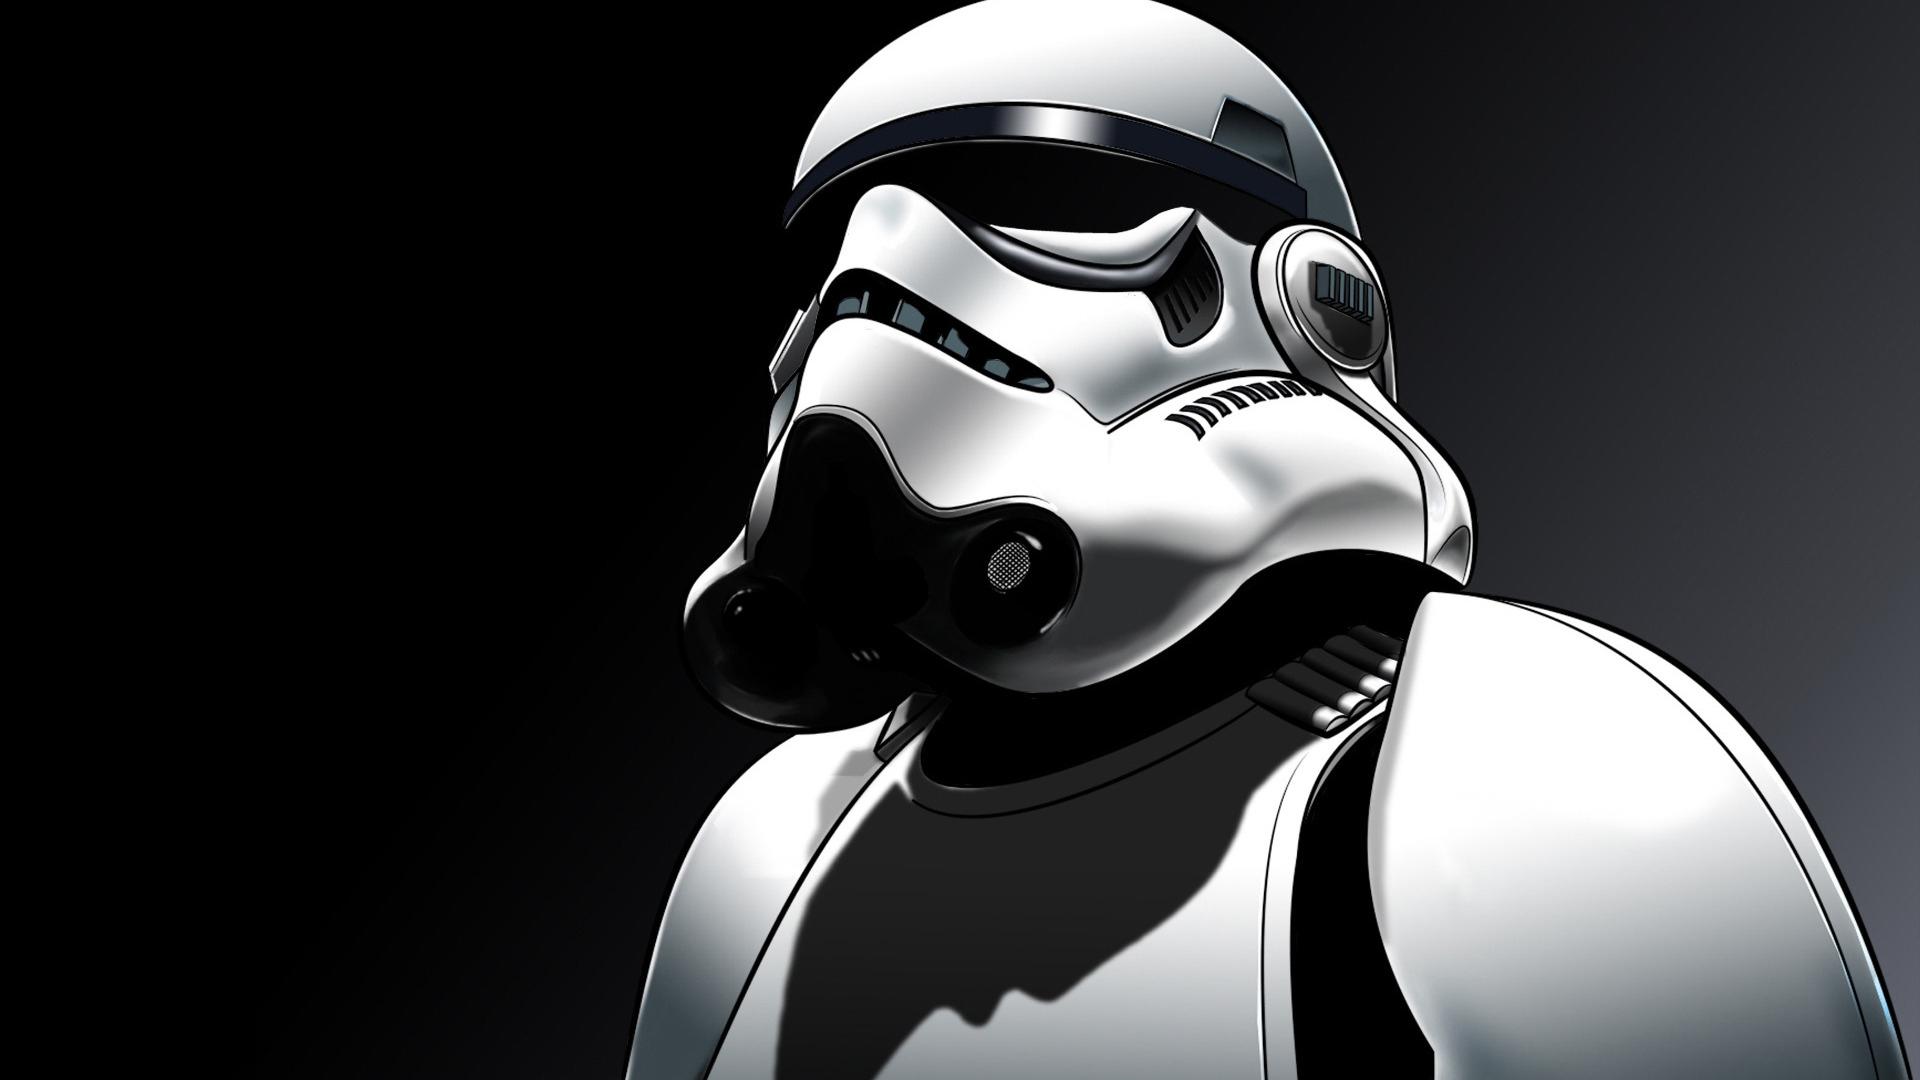 Download Star Wars Images HD Wallpaper of Movie   hdwallpaper2013com 1920x1080